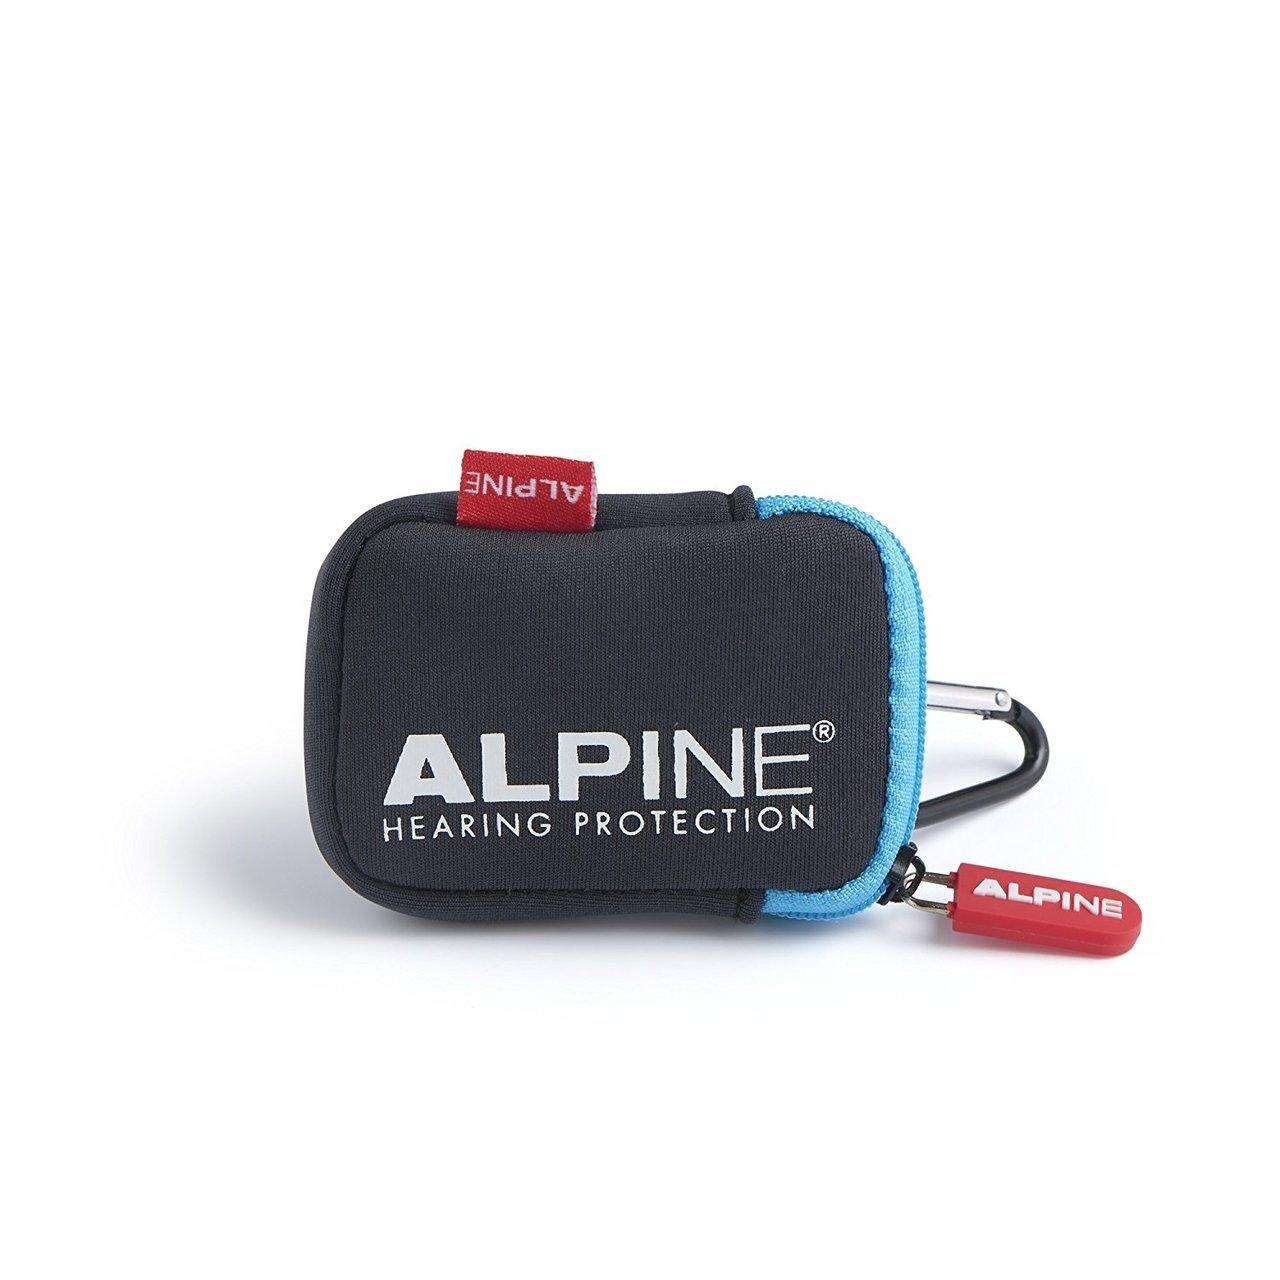 Alpine Surfsafe Earplugs for Surfers